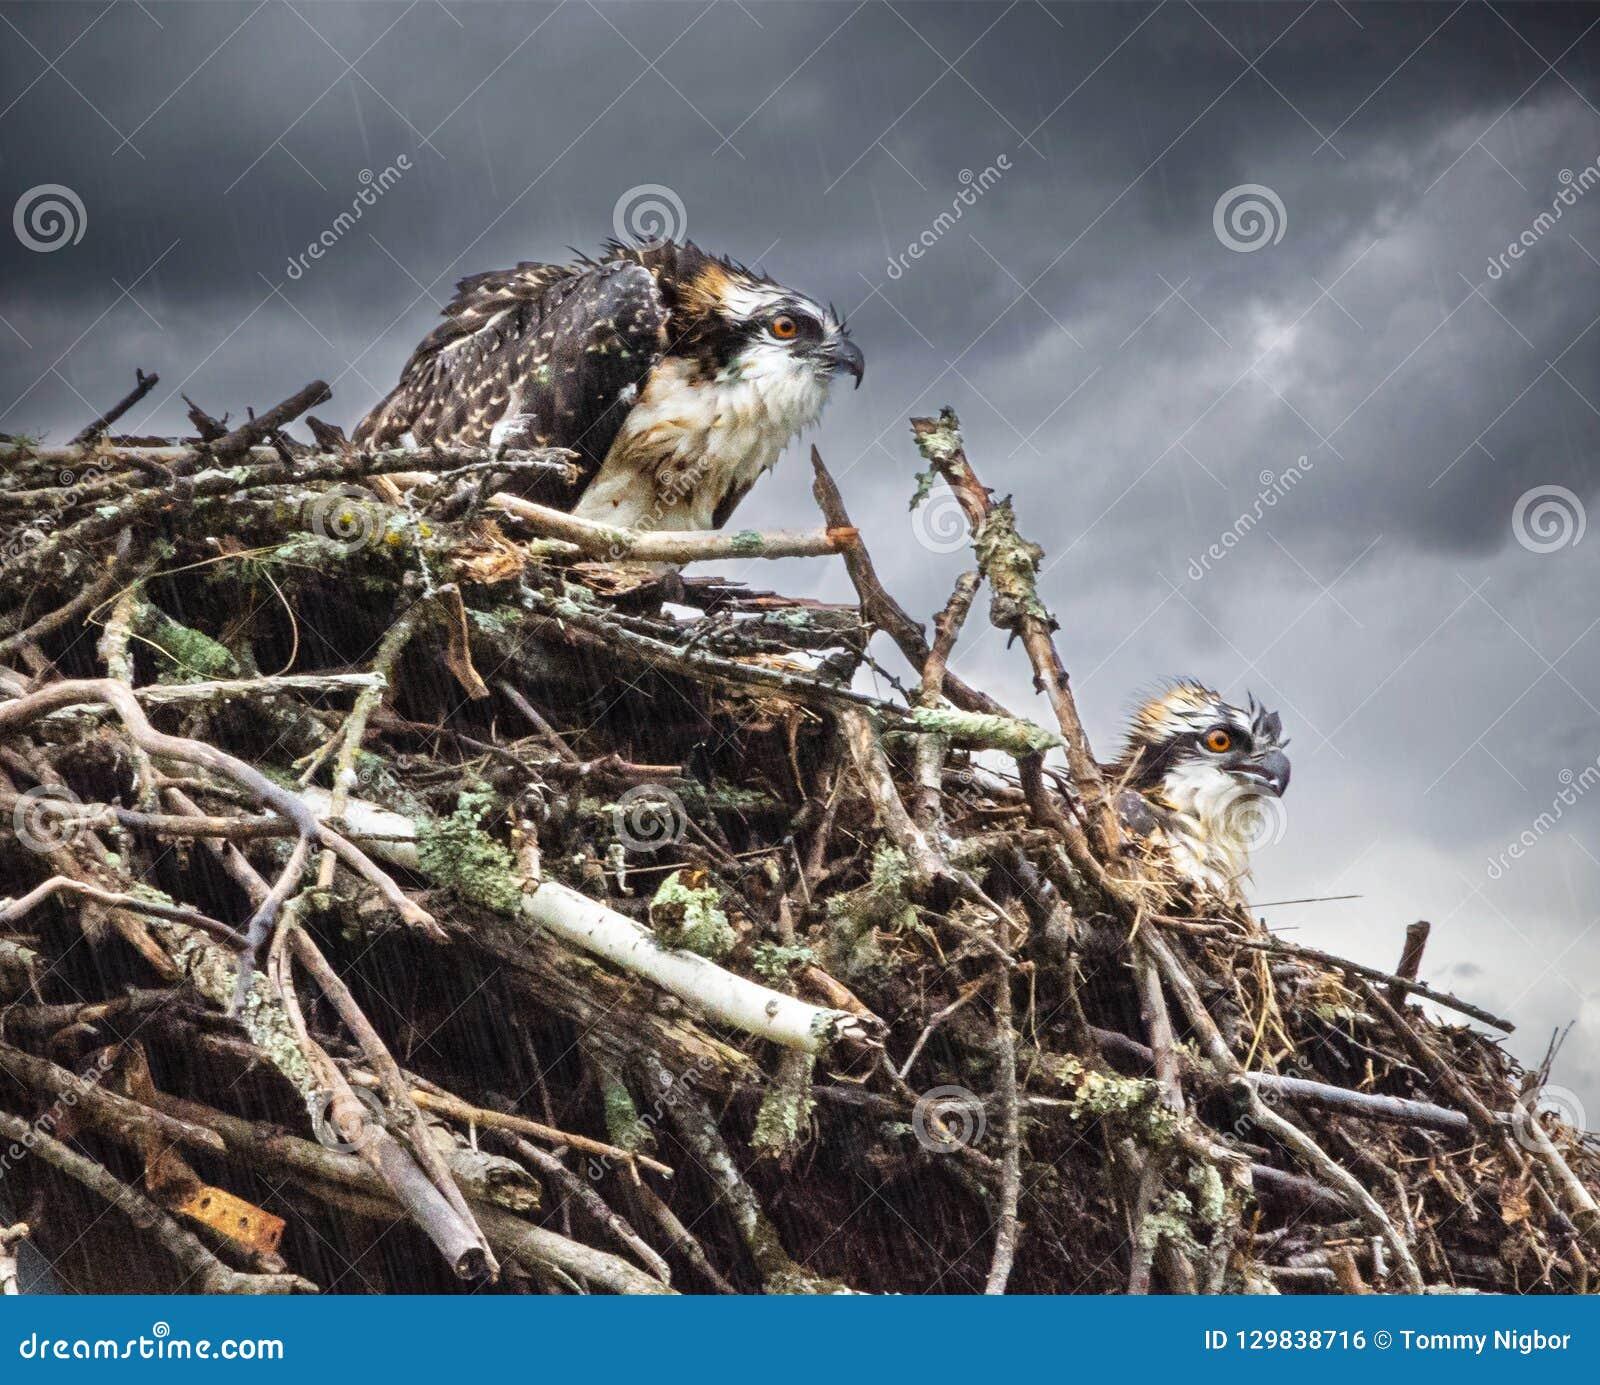 Wet Osprey chicks in Nest Wet rain in back ground looking unhappy